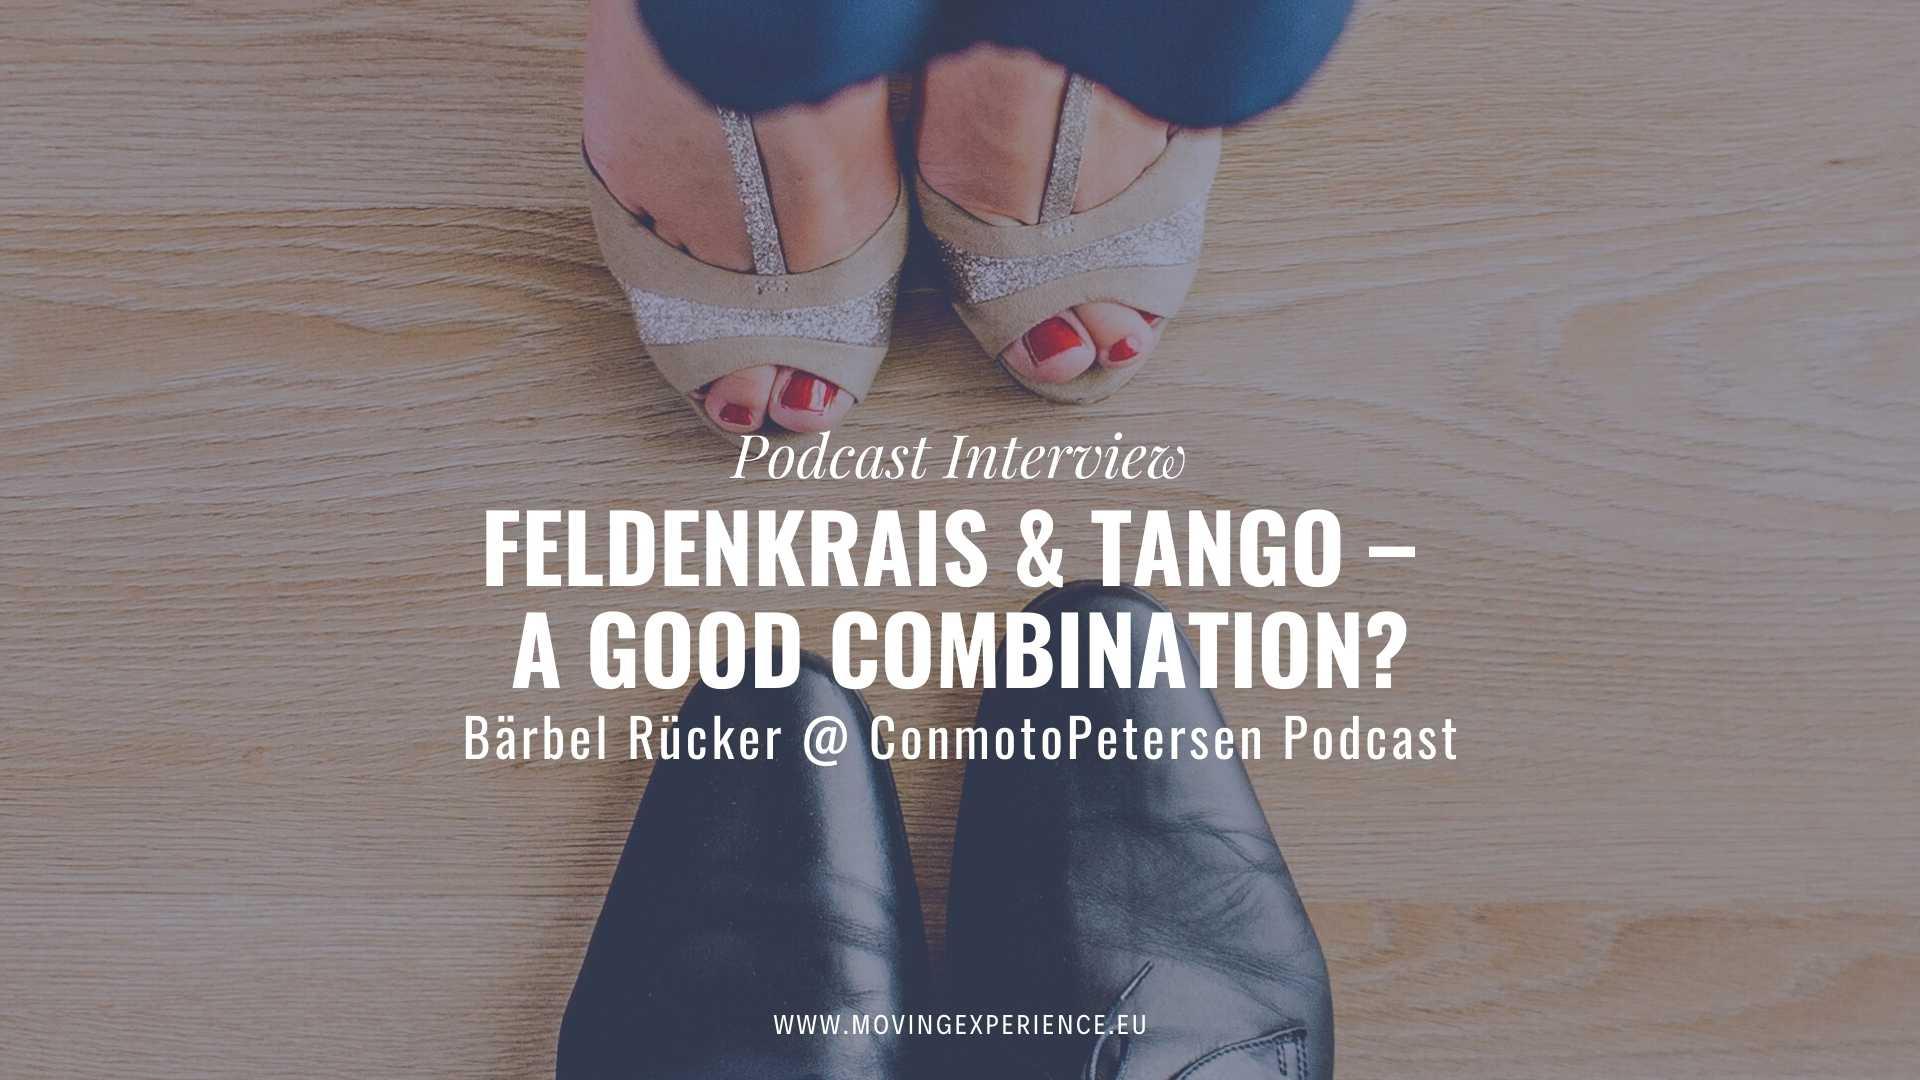 Bärbel & Christina are talking about Tango and Feldenkrais at the ConmotoPetersen Podcast